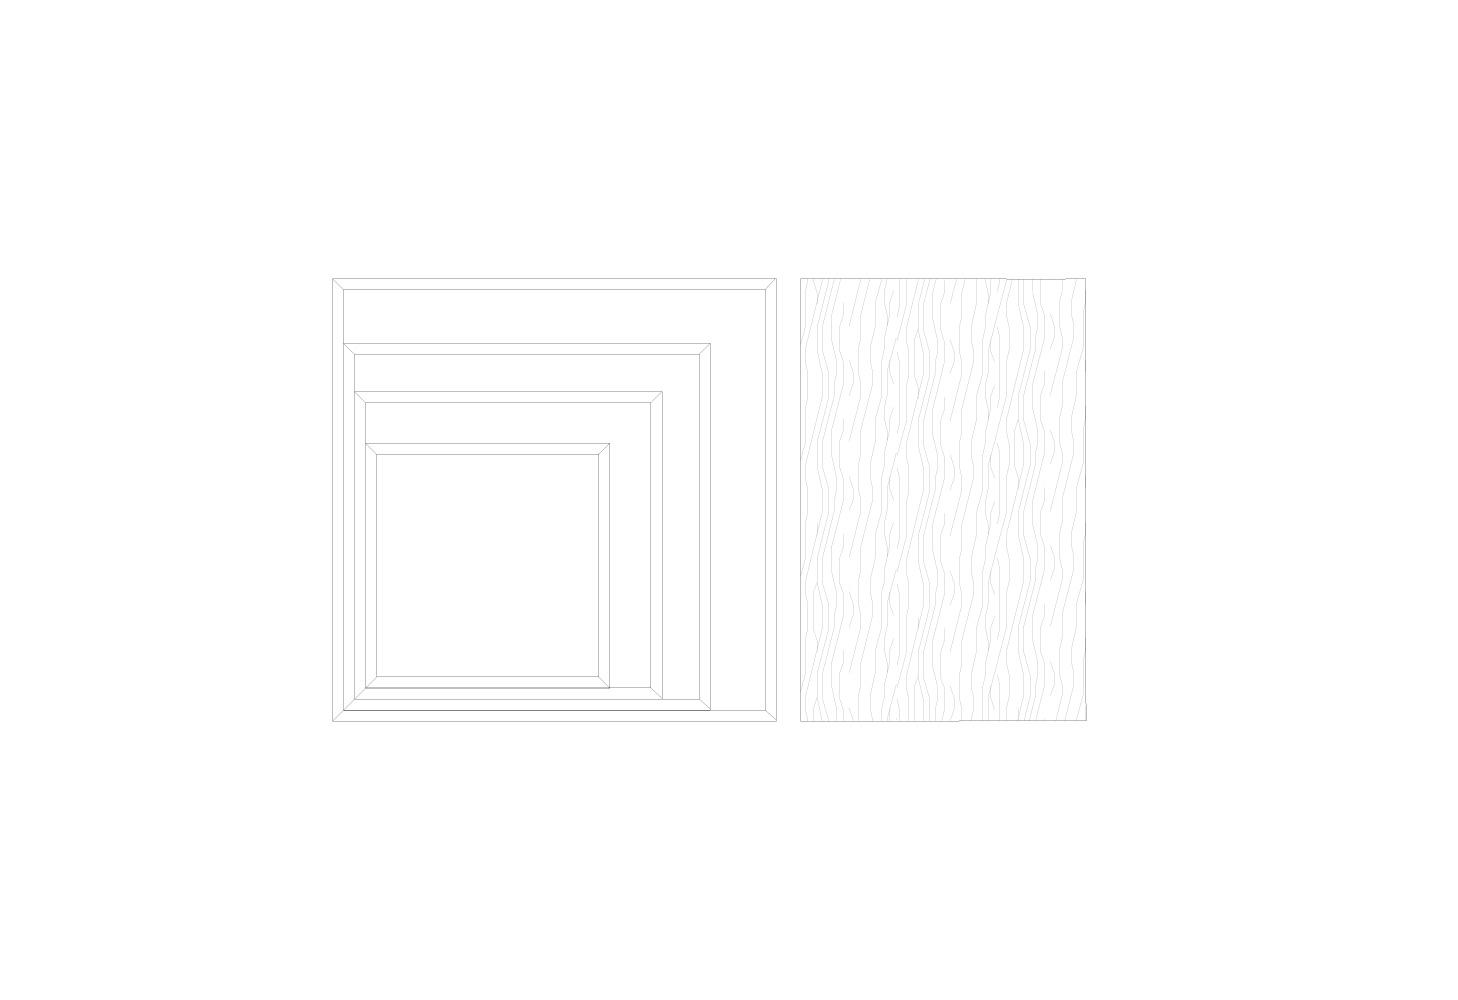 cubi-bixio-disegno